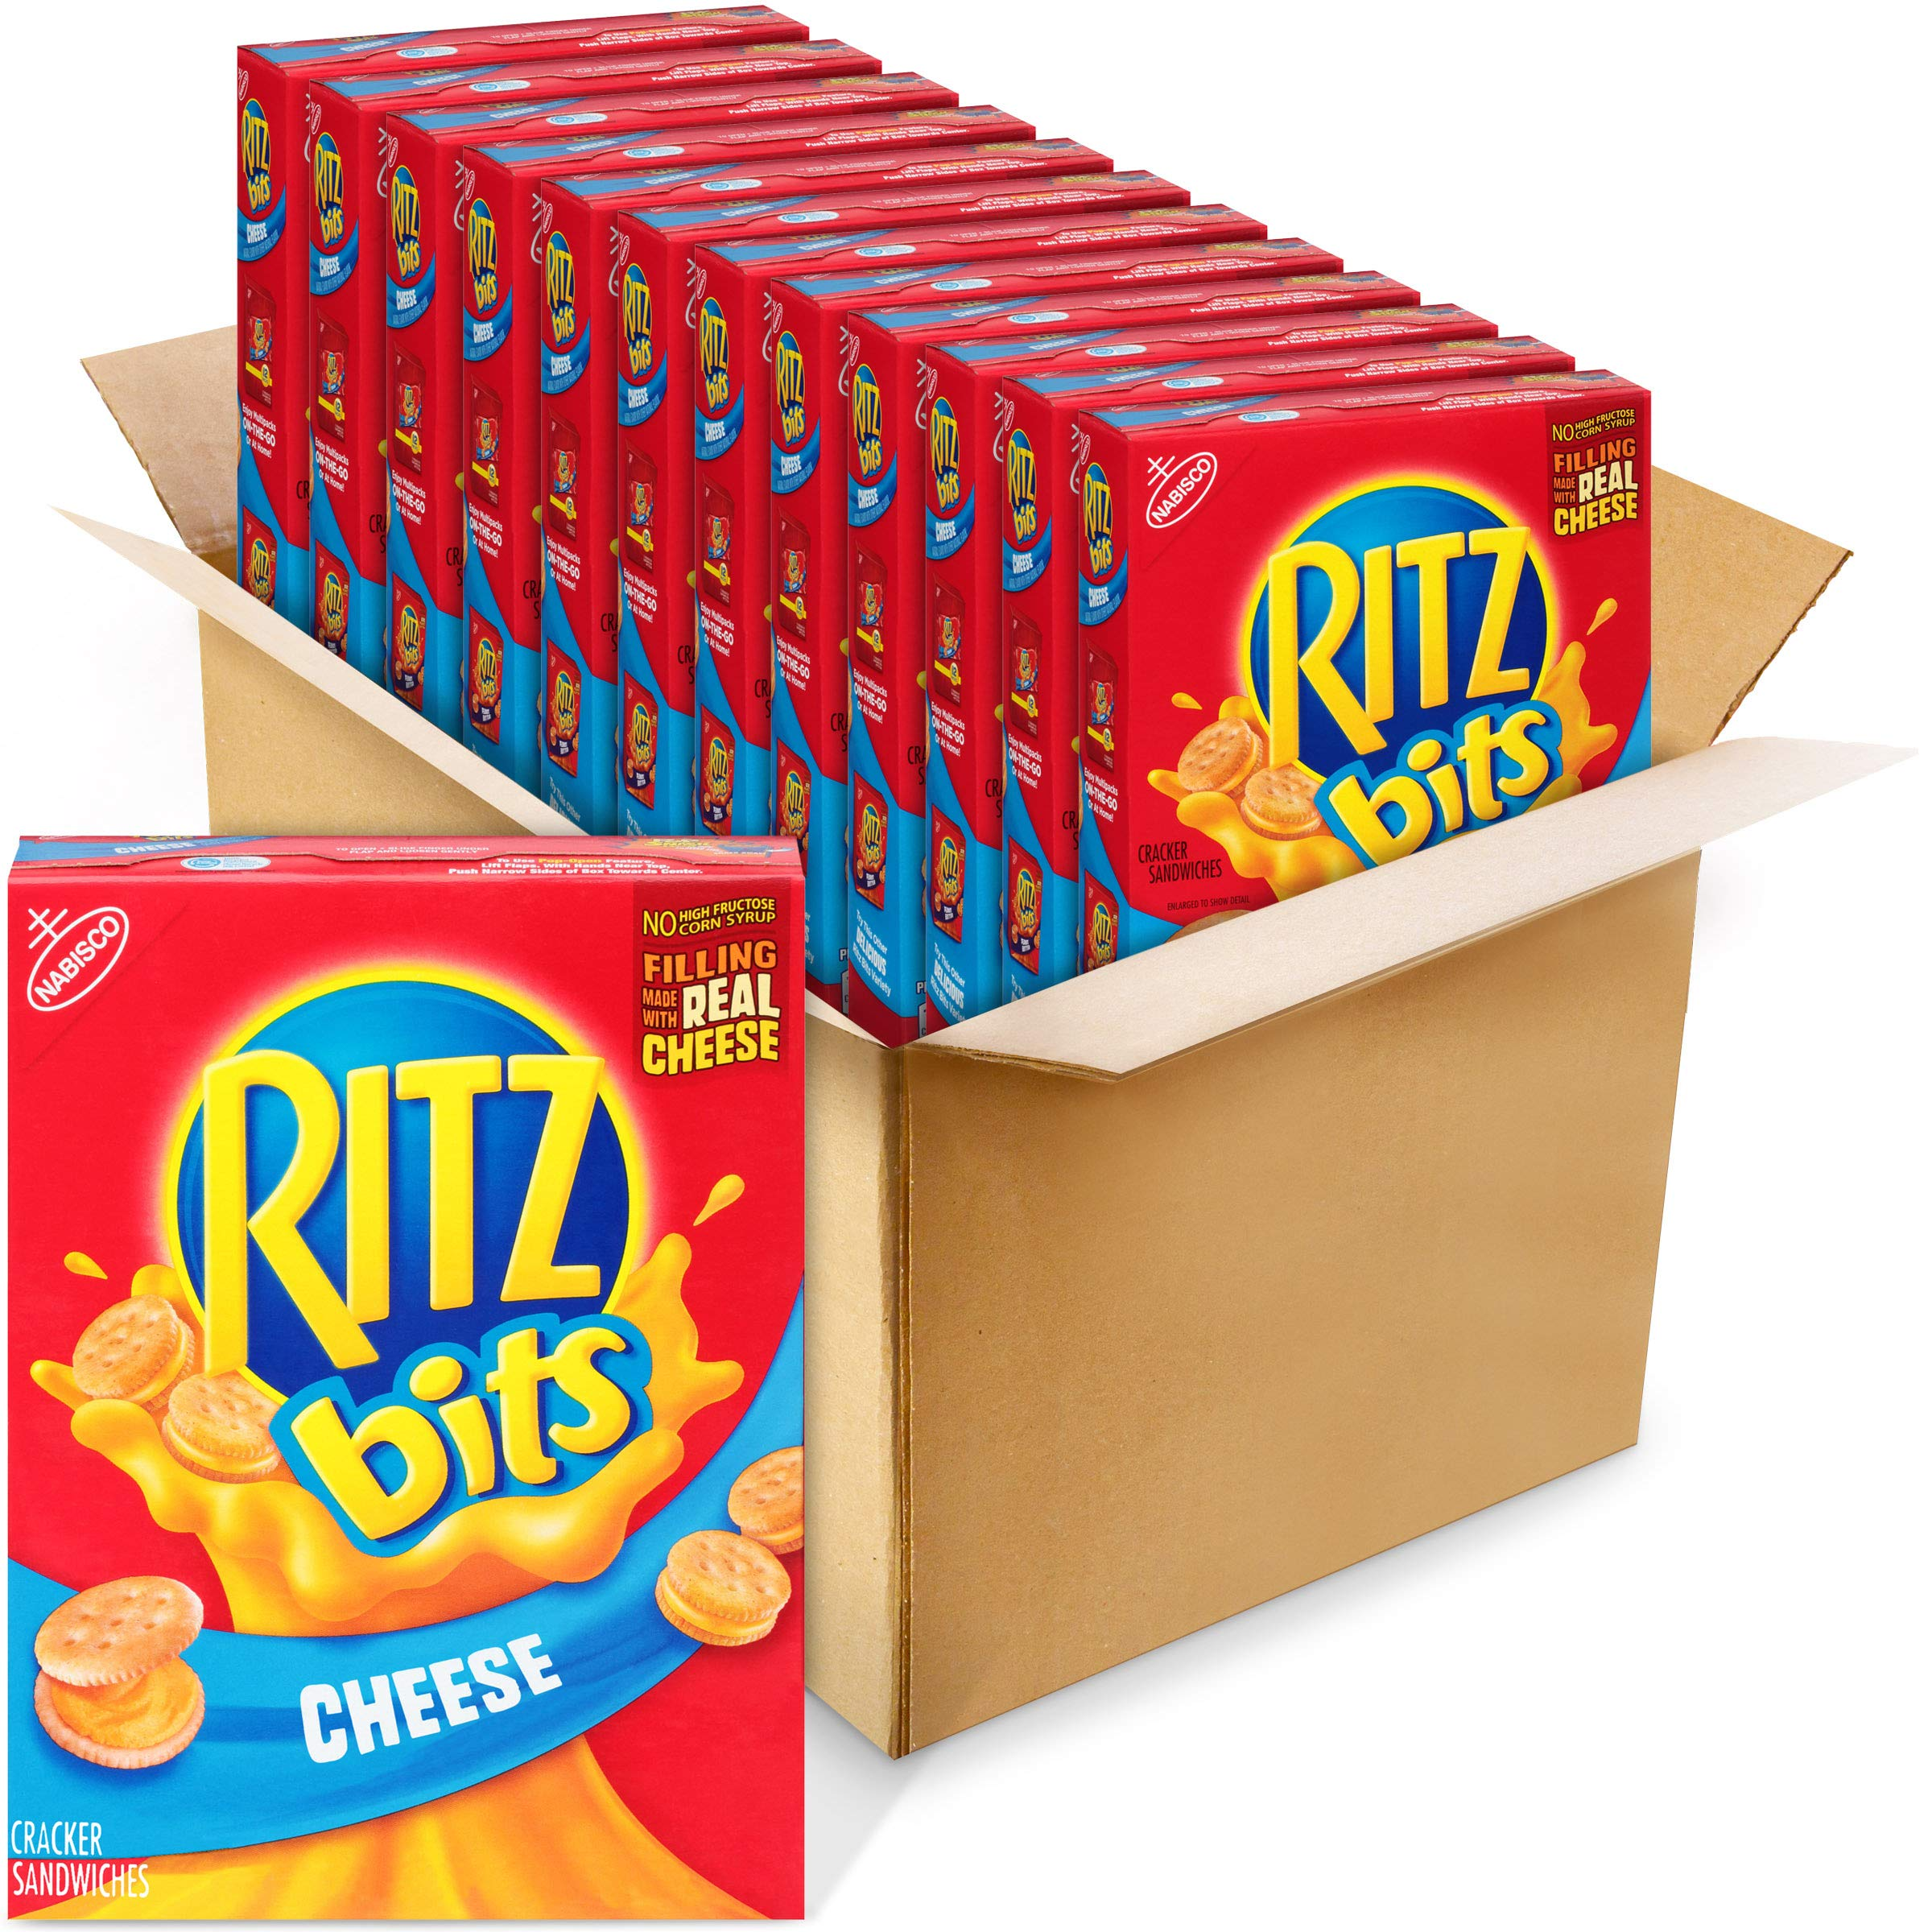 RITZ Bits Cheese Sandwich Crackers, 12 - 8.8 oz Boxes